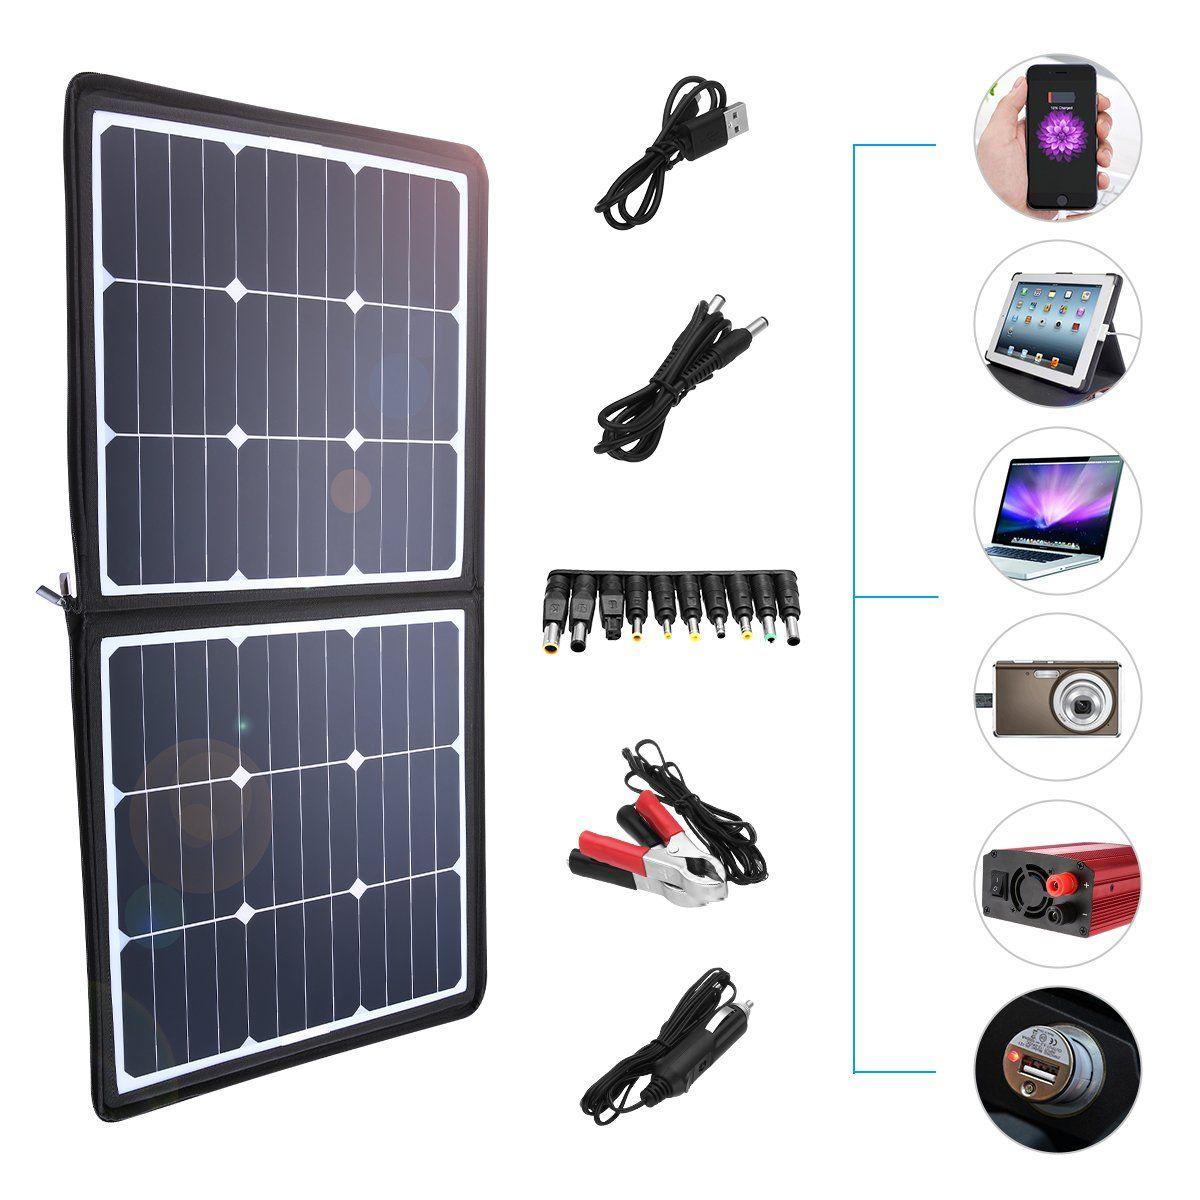 Poweradd 50w Solar Charger 18v 12v Sunpower Solar Panel For Laptop Iphone X 8 8 Plus Ipad Pro Ipad Mini Macbook Ipad Samsun Solar Charger Solar Solar Panels